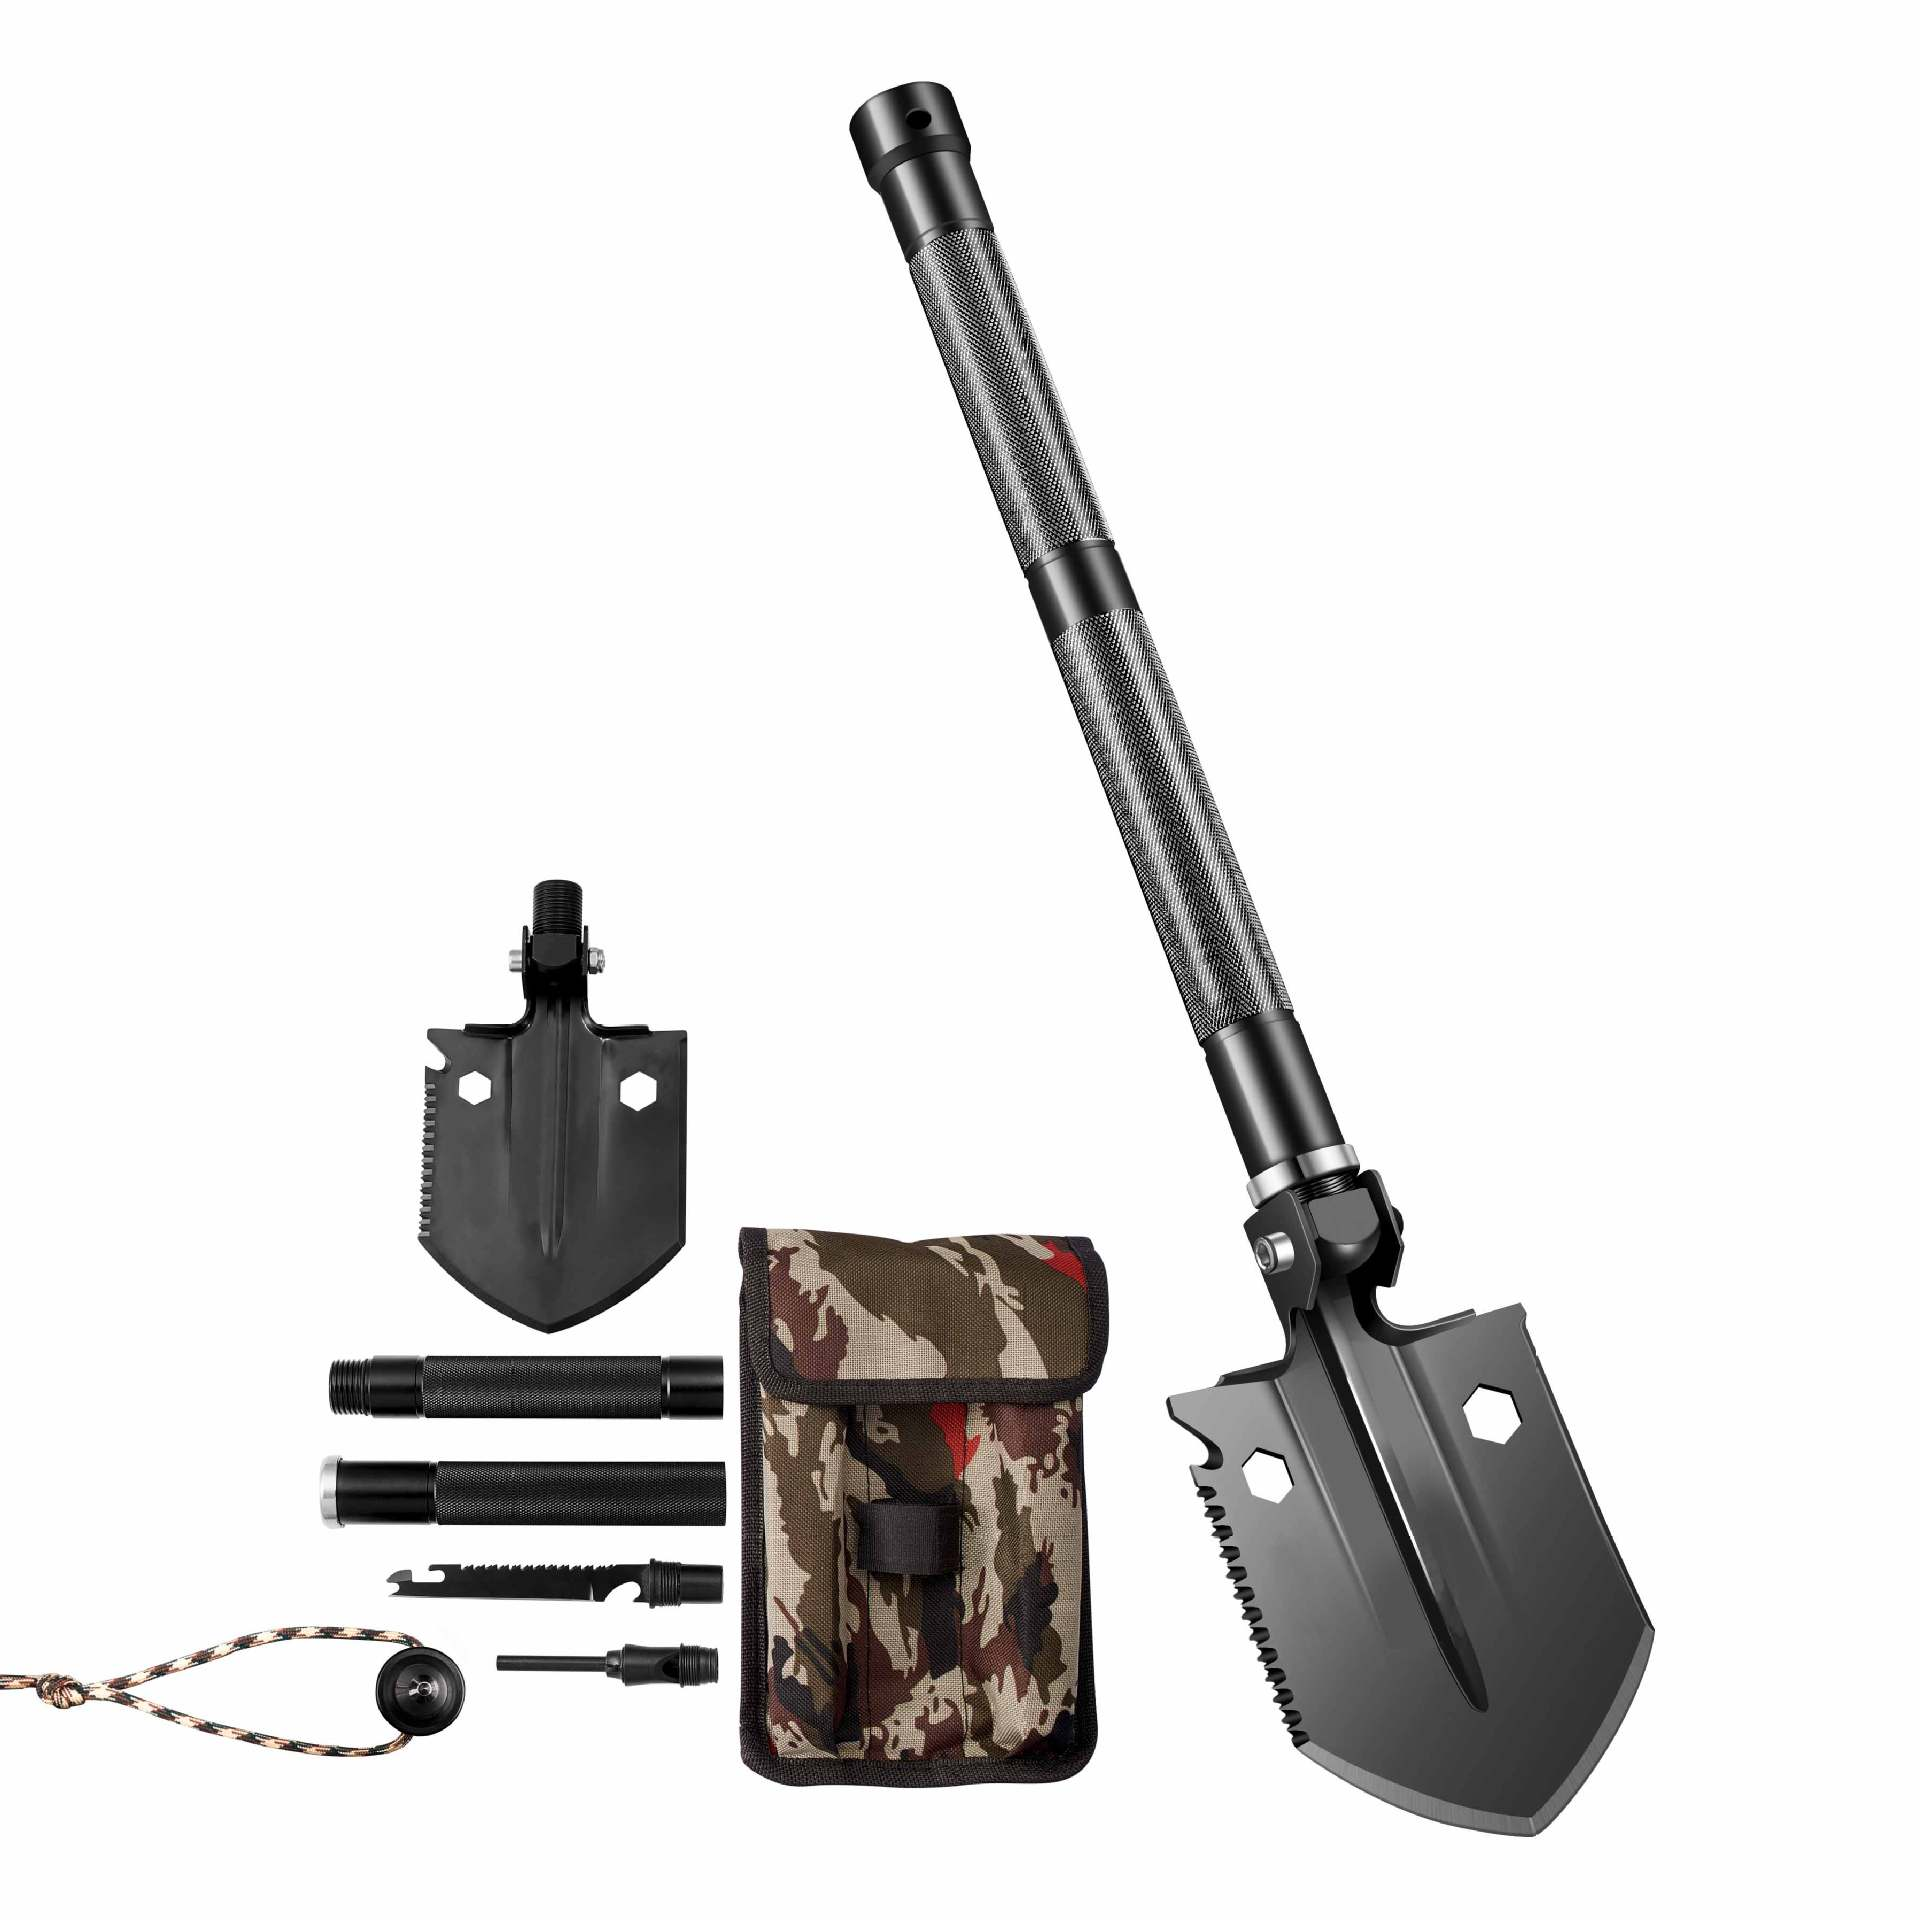 HX Mini Engineer Shovel Outdoor Survival Multi-purpose Soldier Shovel Camping Fishing Foldable Military Emergency Shovel Weapon